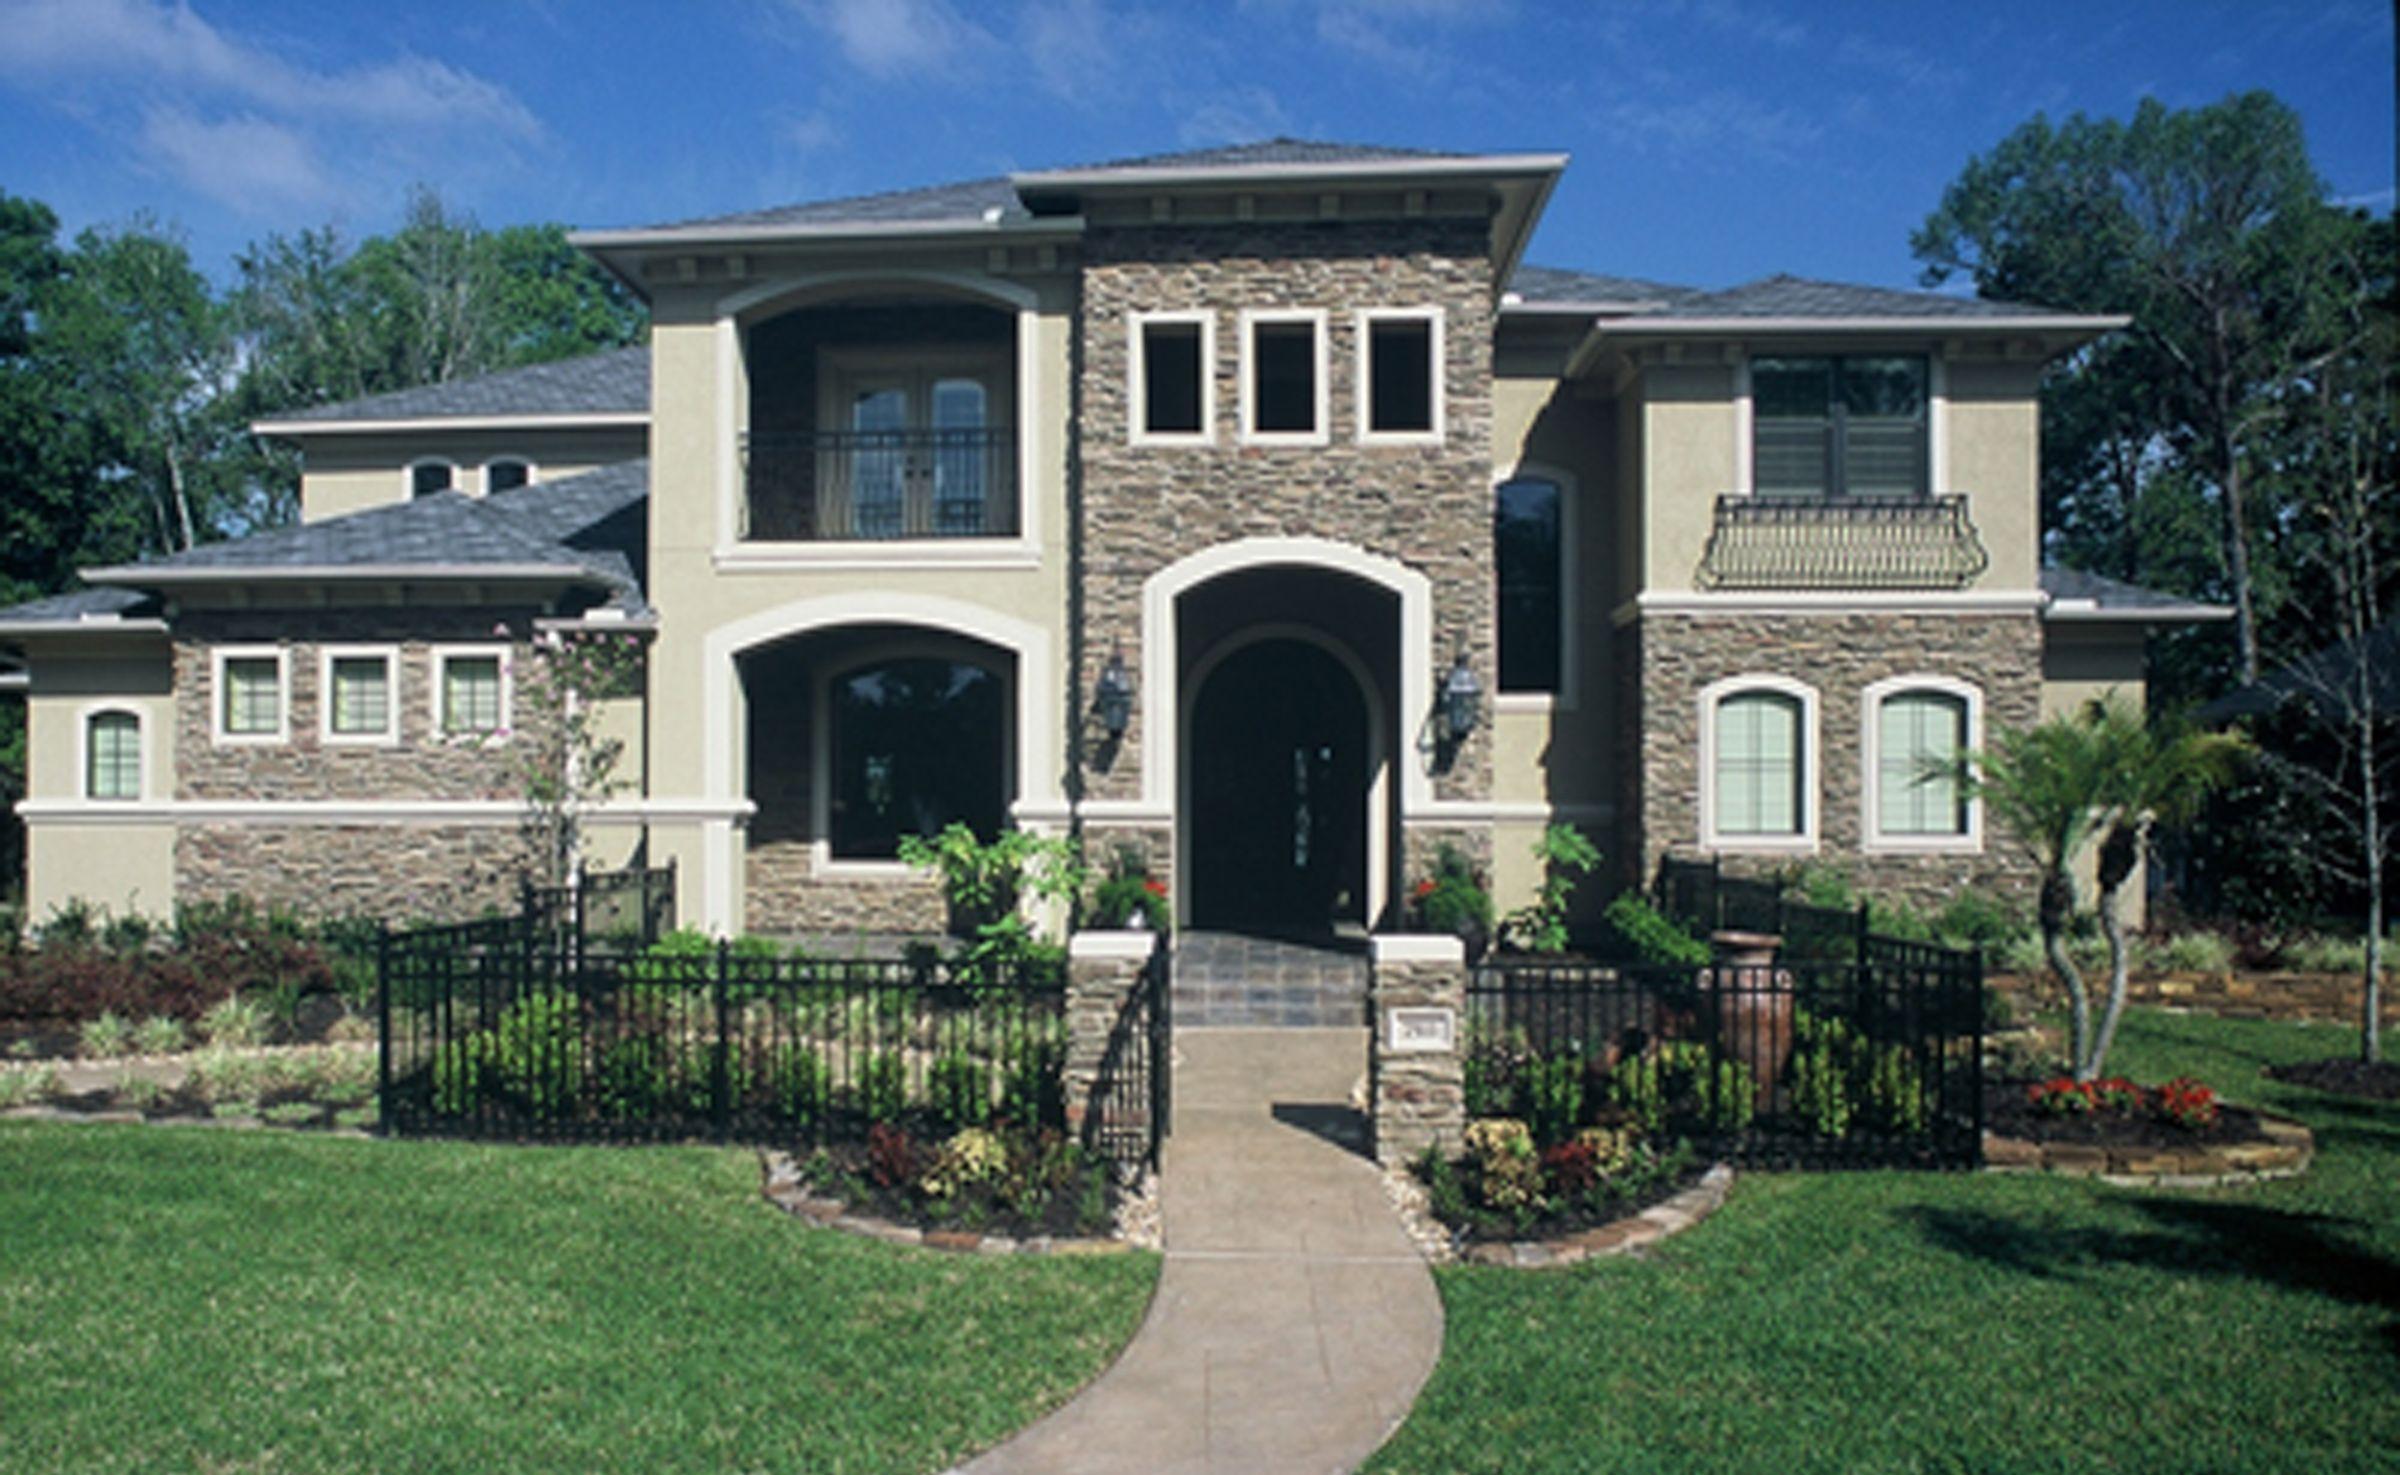 Custom Home Designers Houston Texas - Frontier custom builders inc in houston texas has mastered the art of custom home architecture